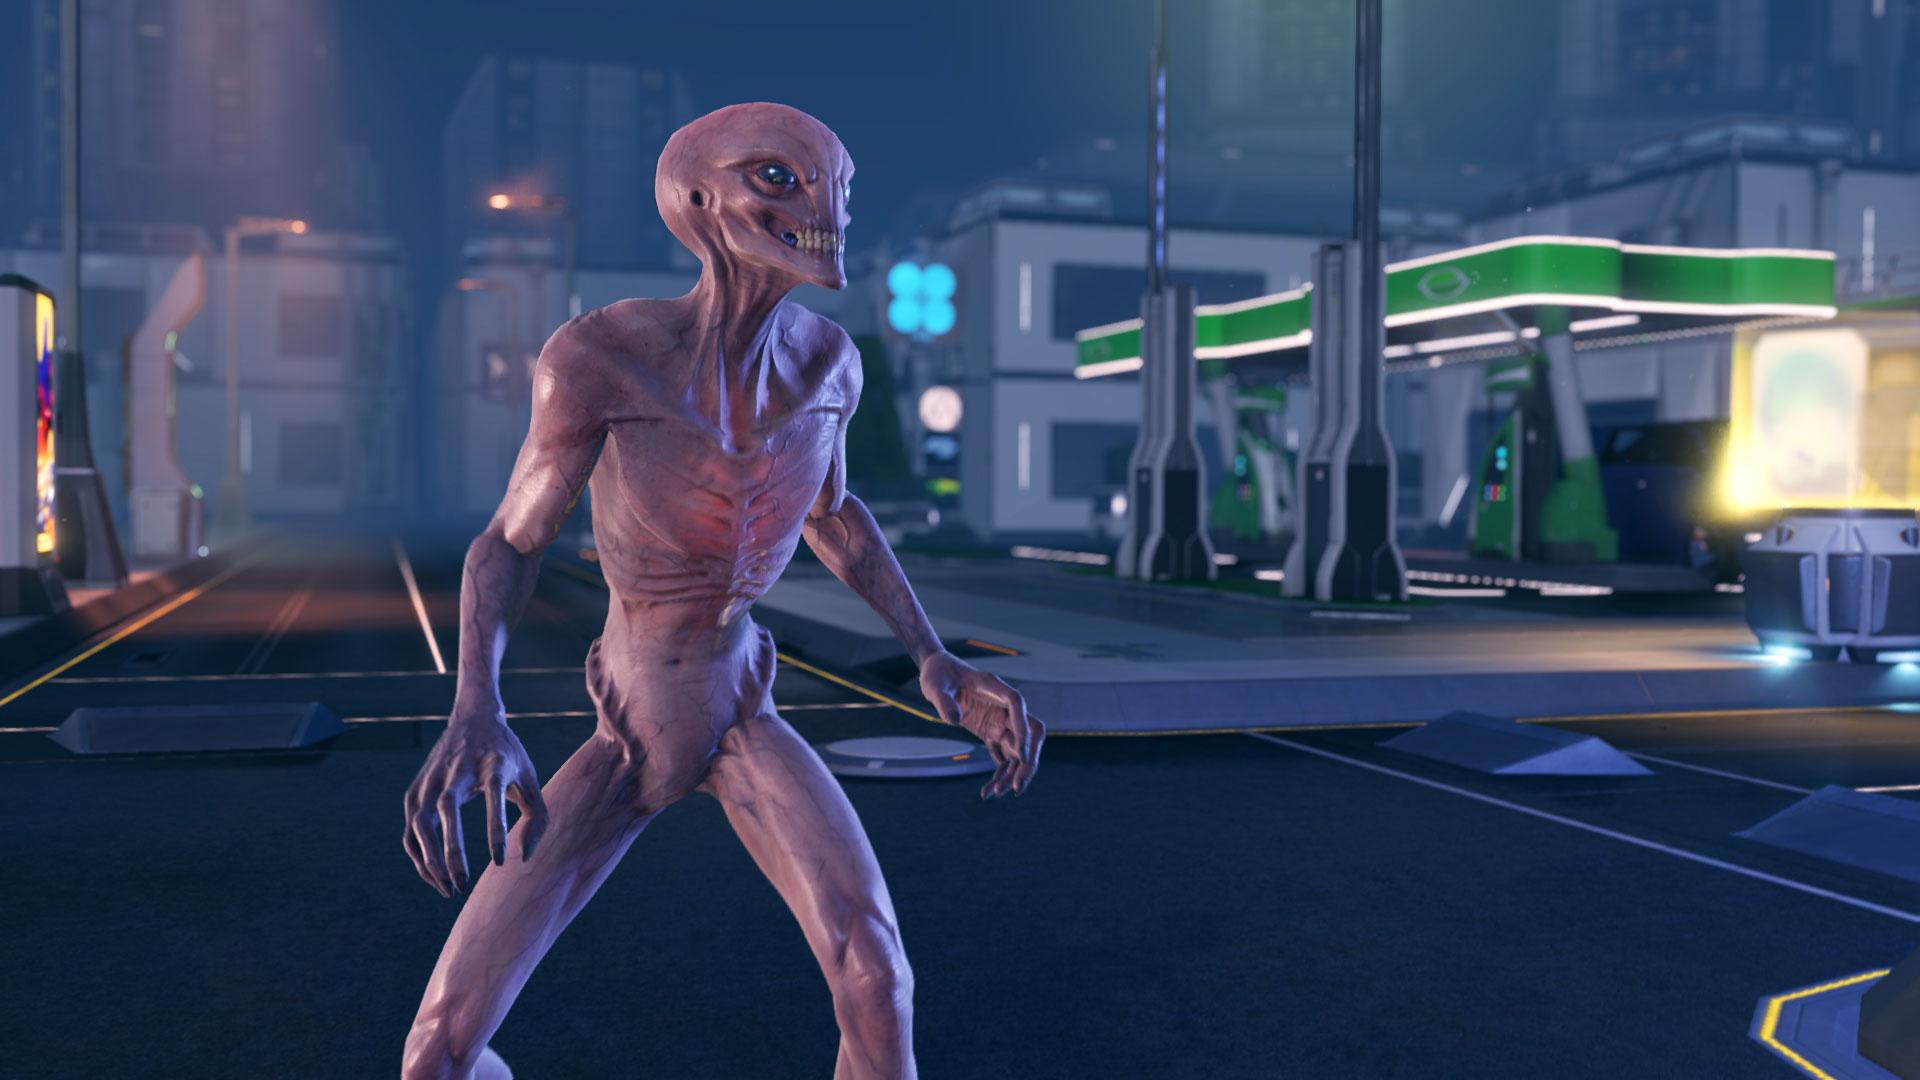 Анонс игры XCOM 2 от 2K и Firaxis Games